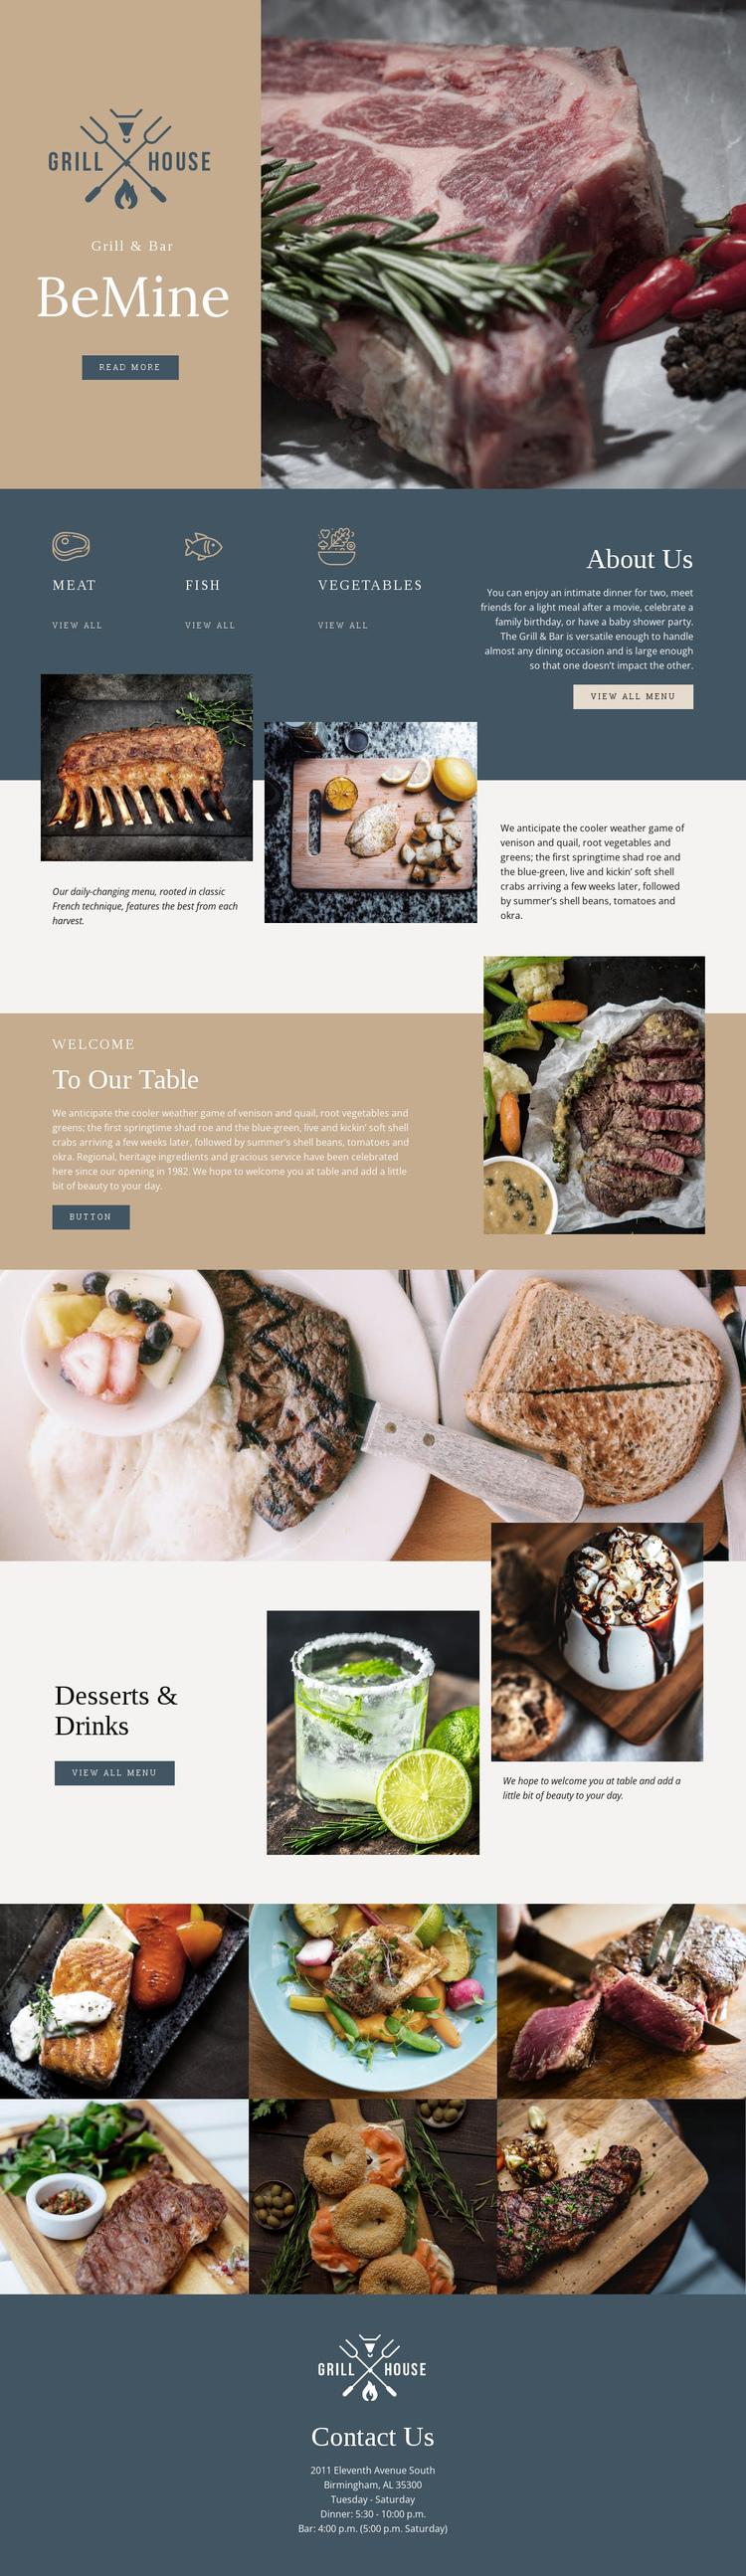 Finest grill house restaurant Website Builder Software